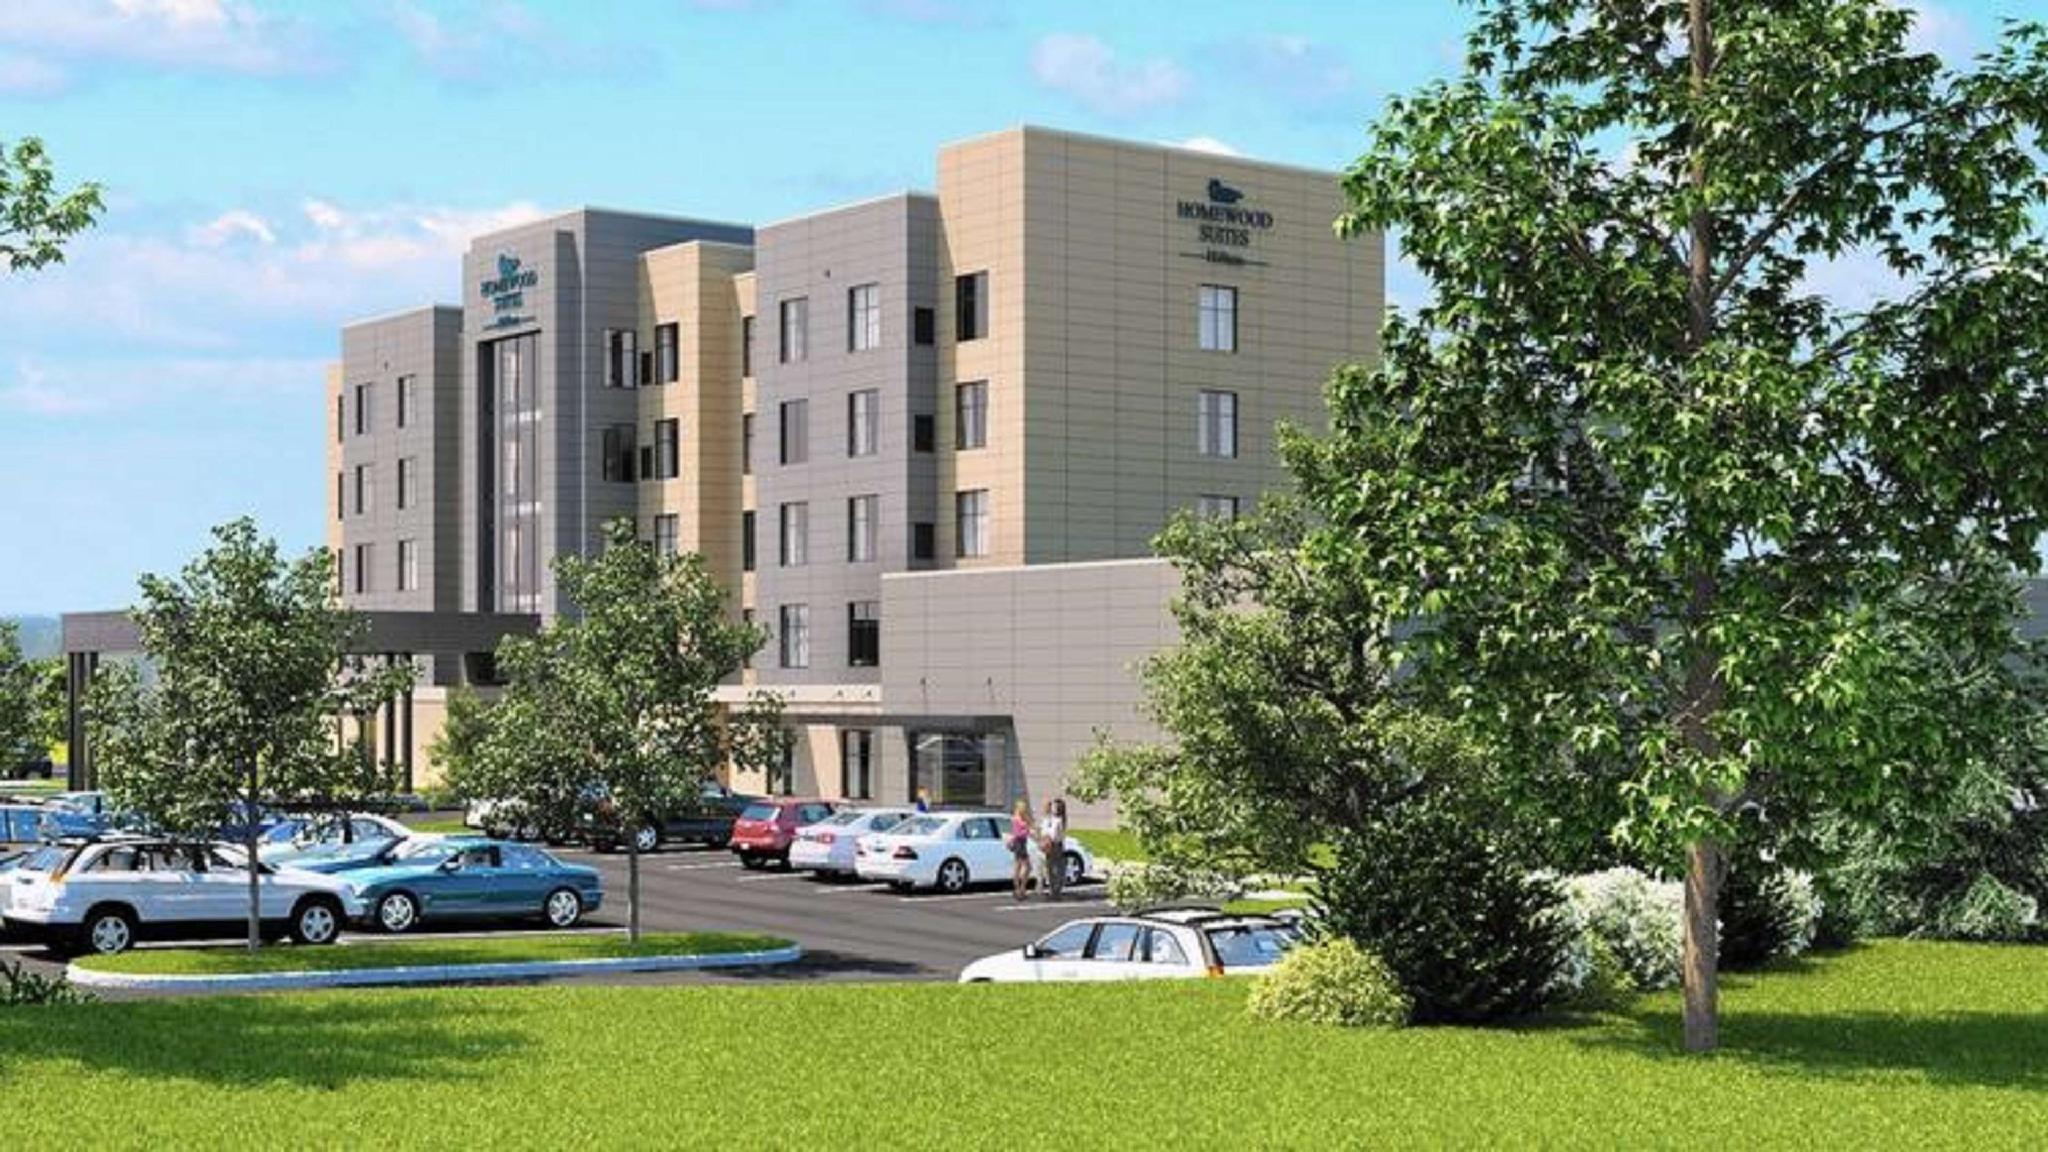 Homewood Suites By Hilton Allentown Bethlehem Center Valley